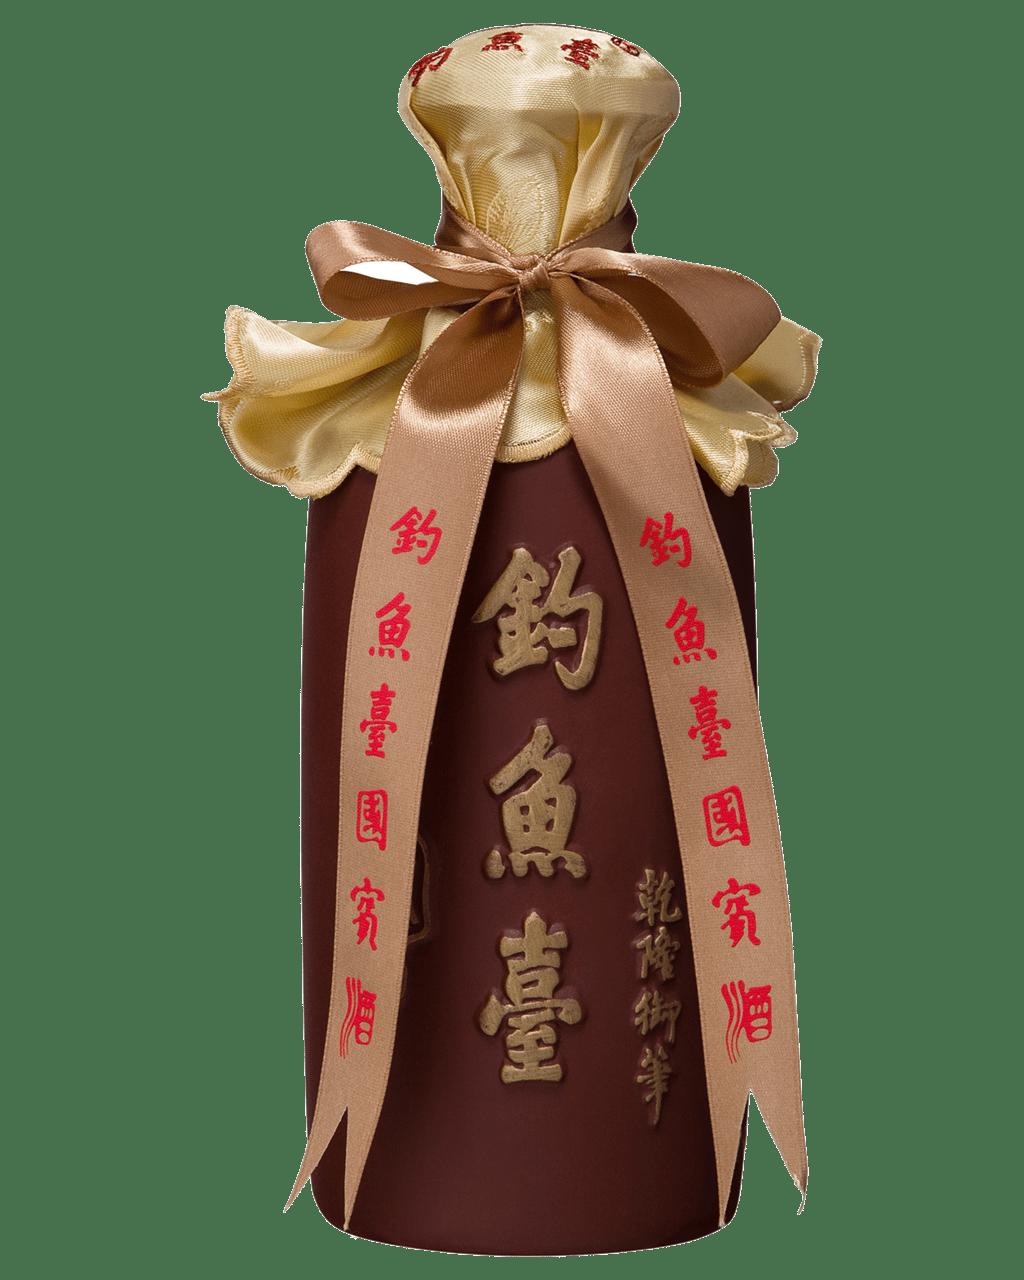 Diaoyutai Ambassador Liquor 500Ml - Dan Murphys Connections - Buy